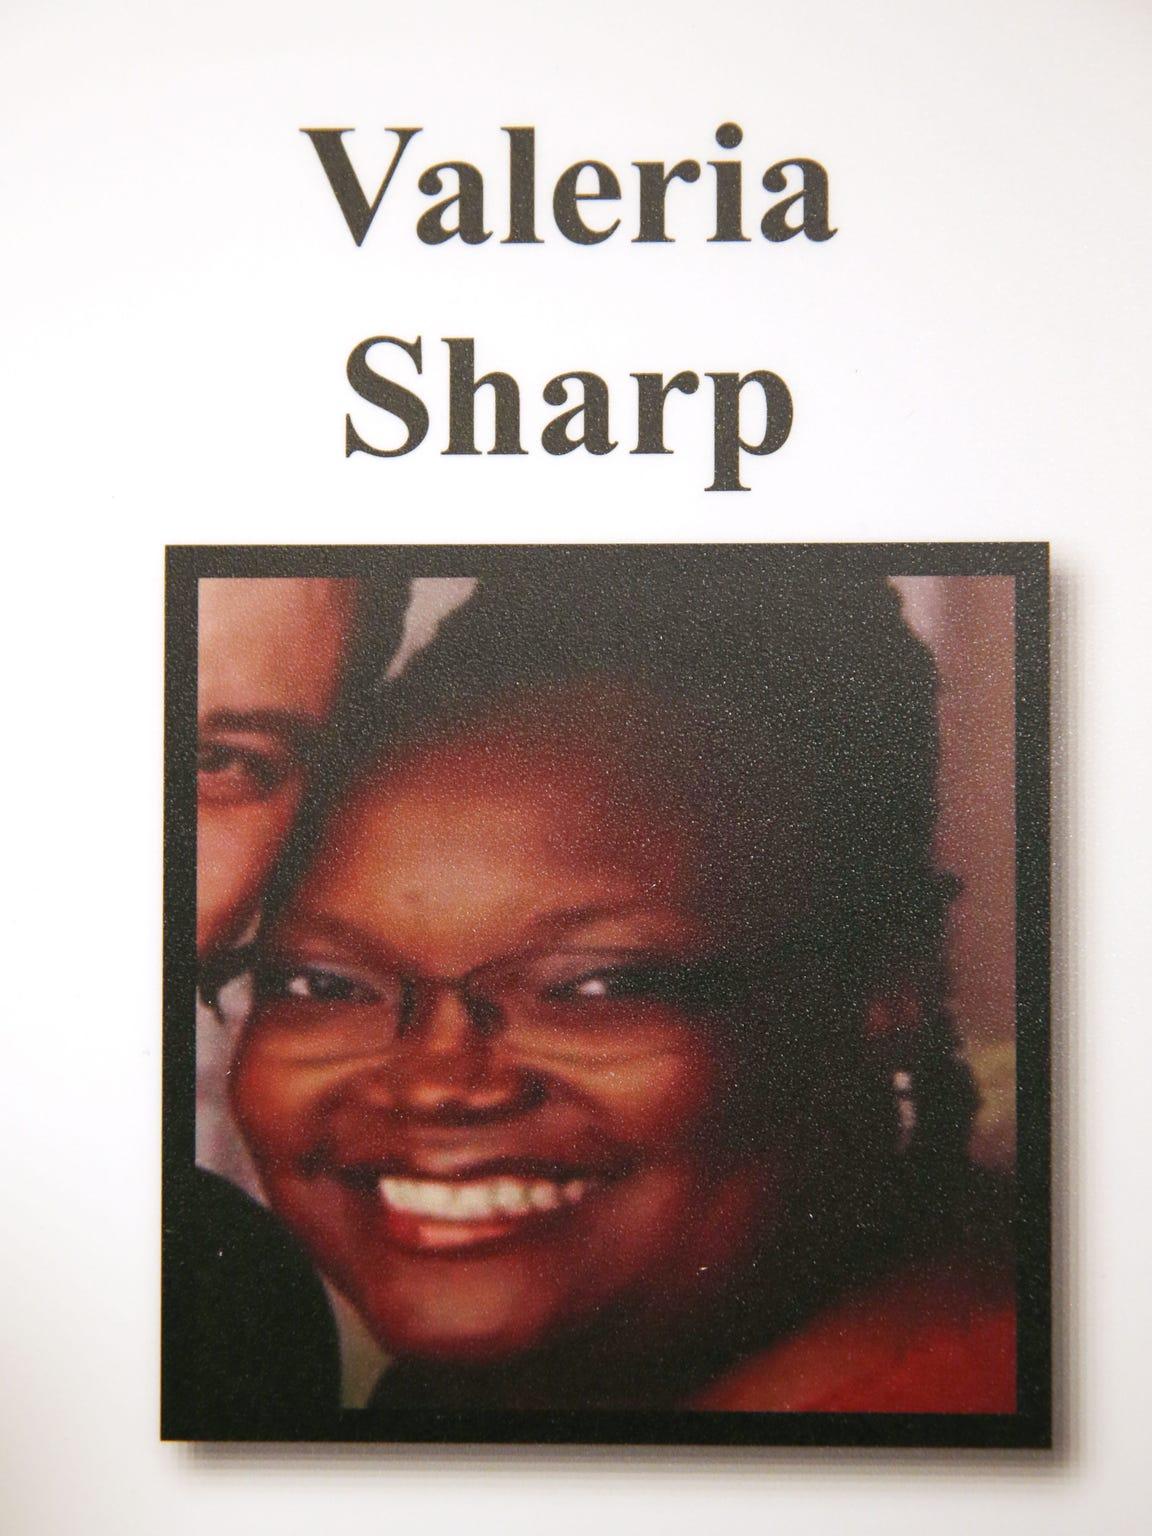 A photo of Veleria Sharp, a victim of Dwight Jones,